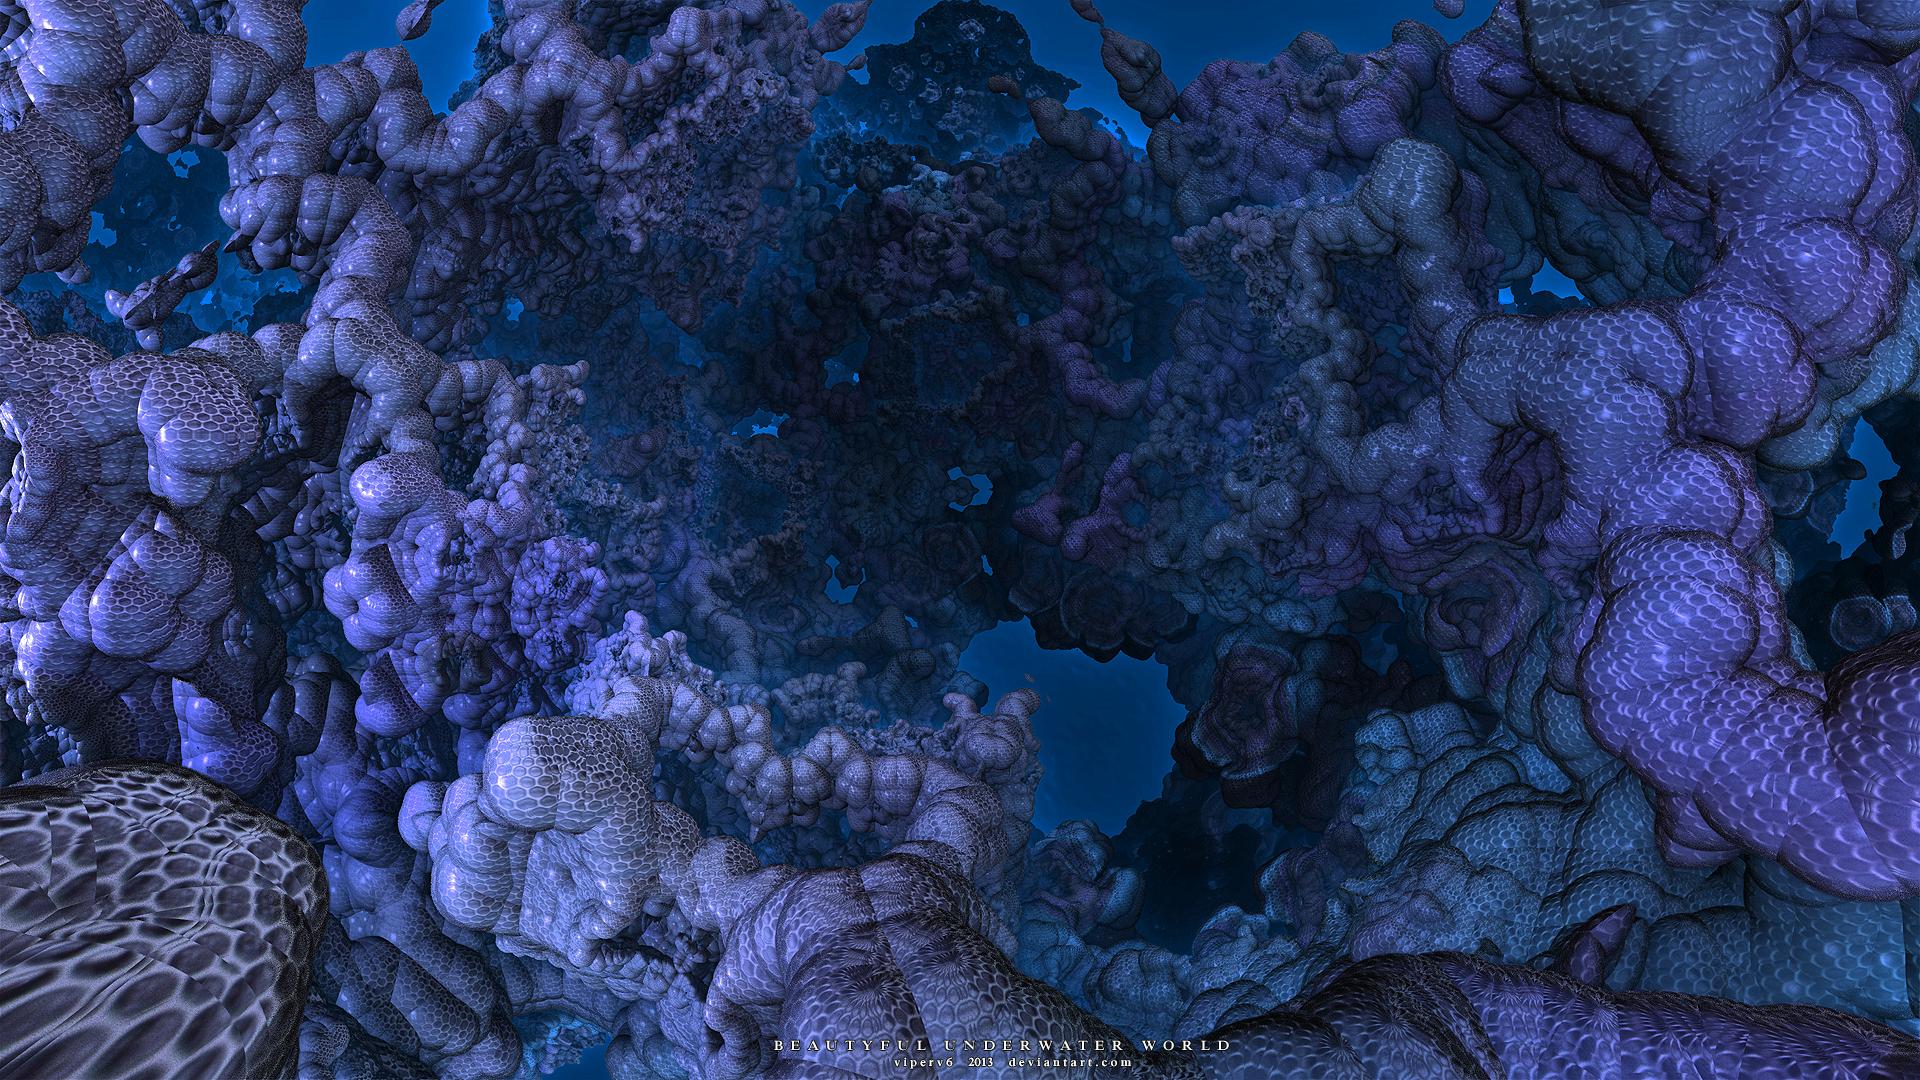 Beautyful Underwater World by viperv6